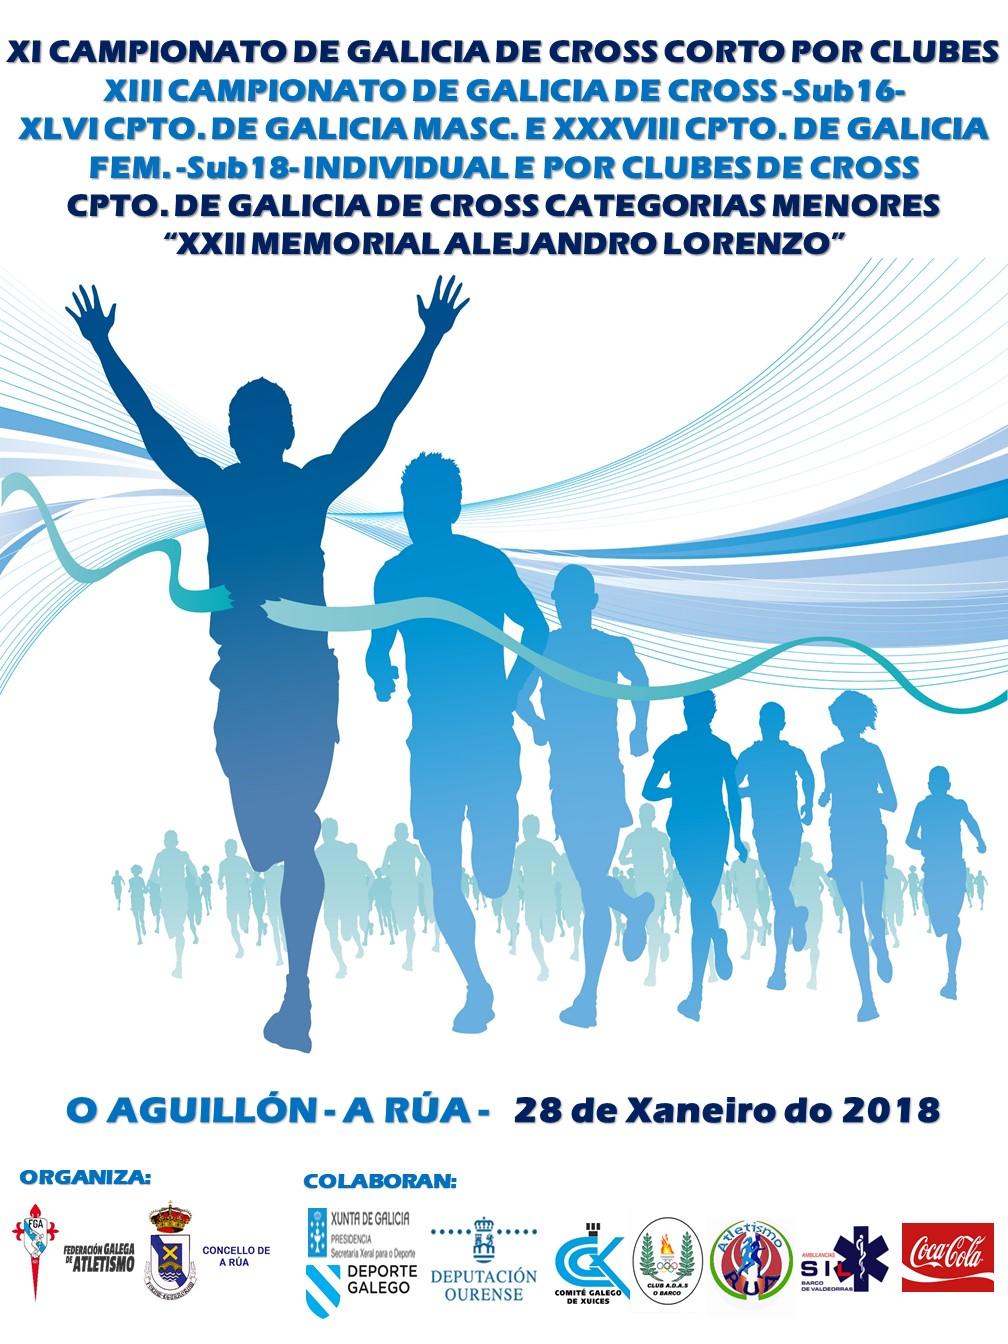 XIII Campionato de Galicia Sub16 (CAD) – XLVI Sub18 (XUV) H – XXXVIII Sub18 (XUV) M Individual e Clubs de Campo a Través